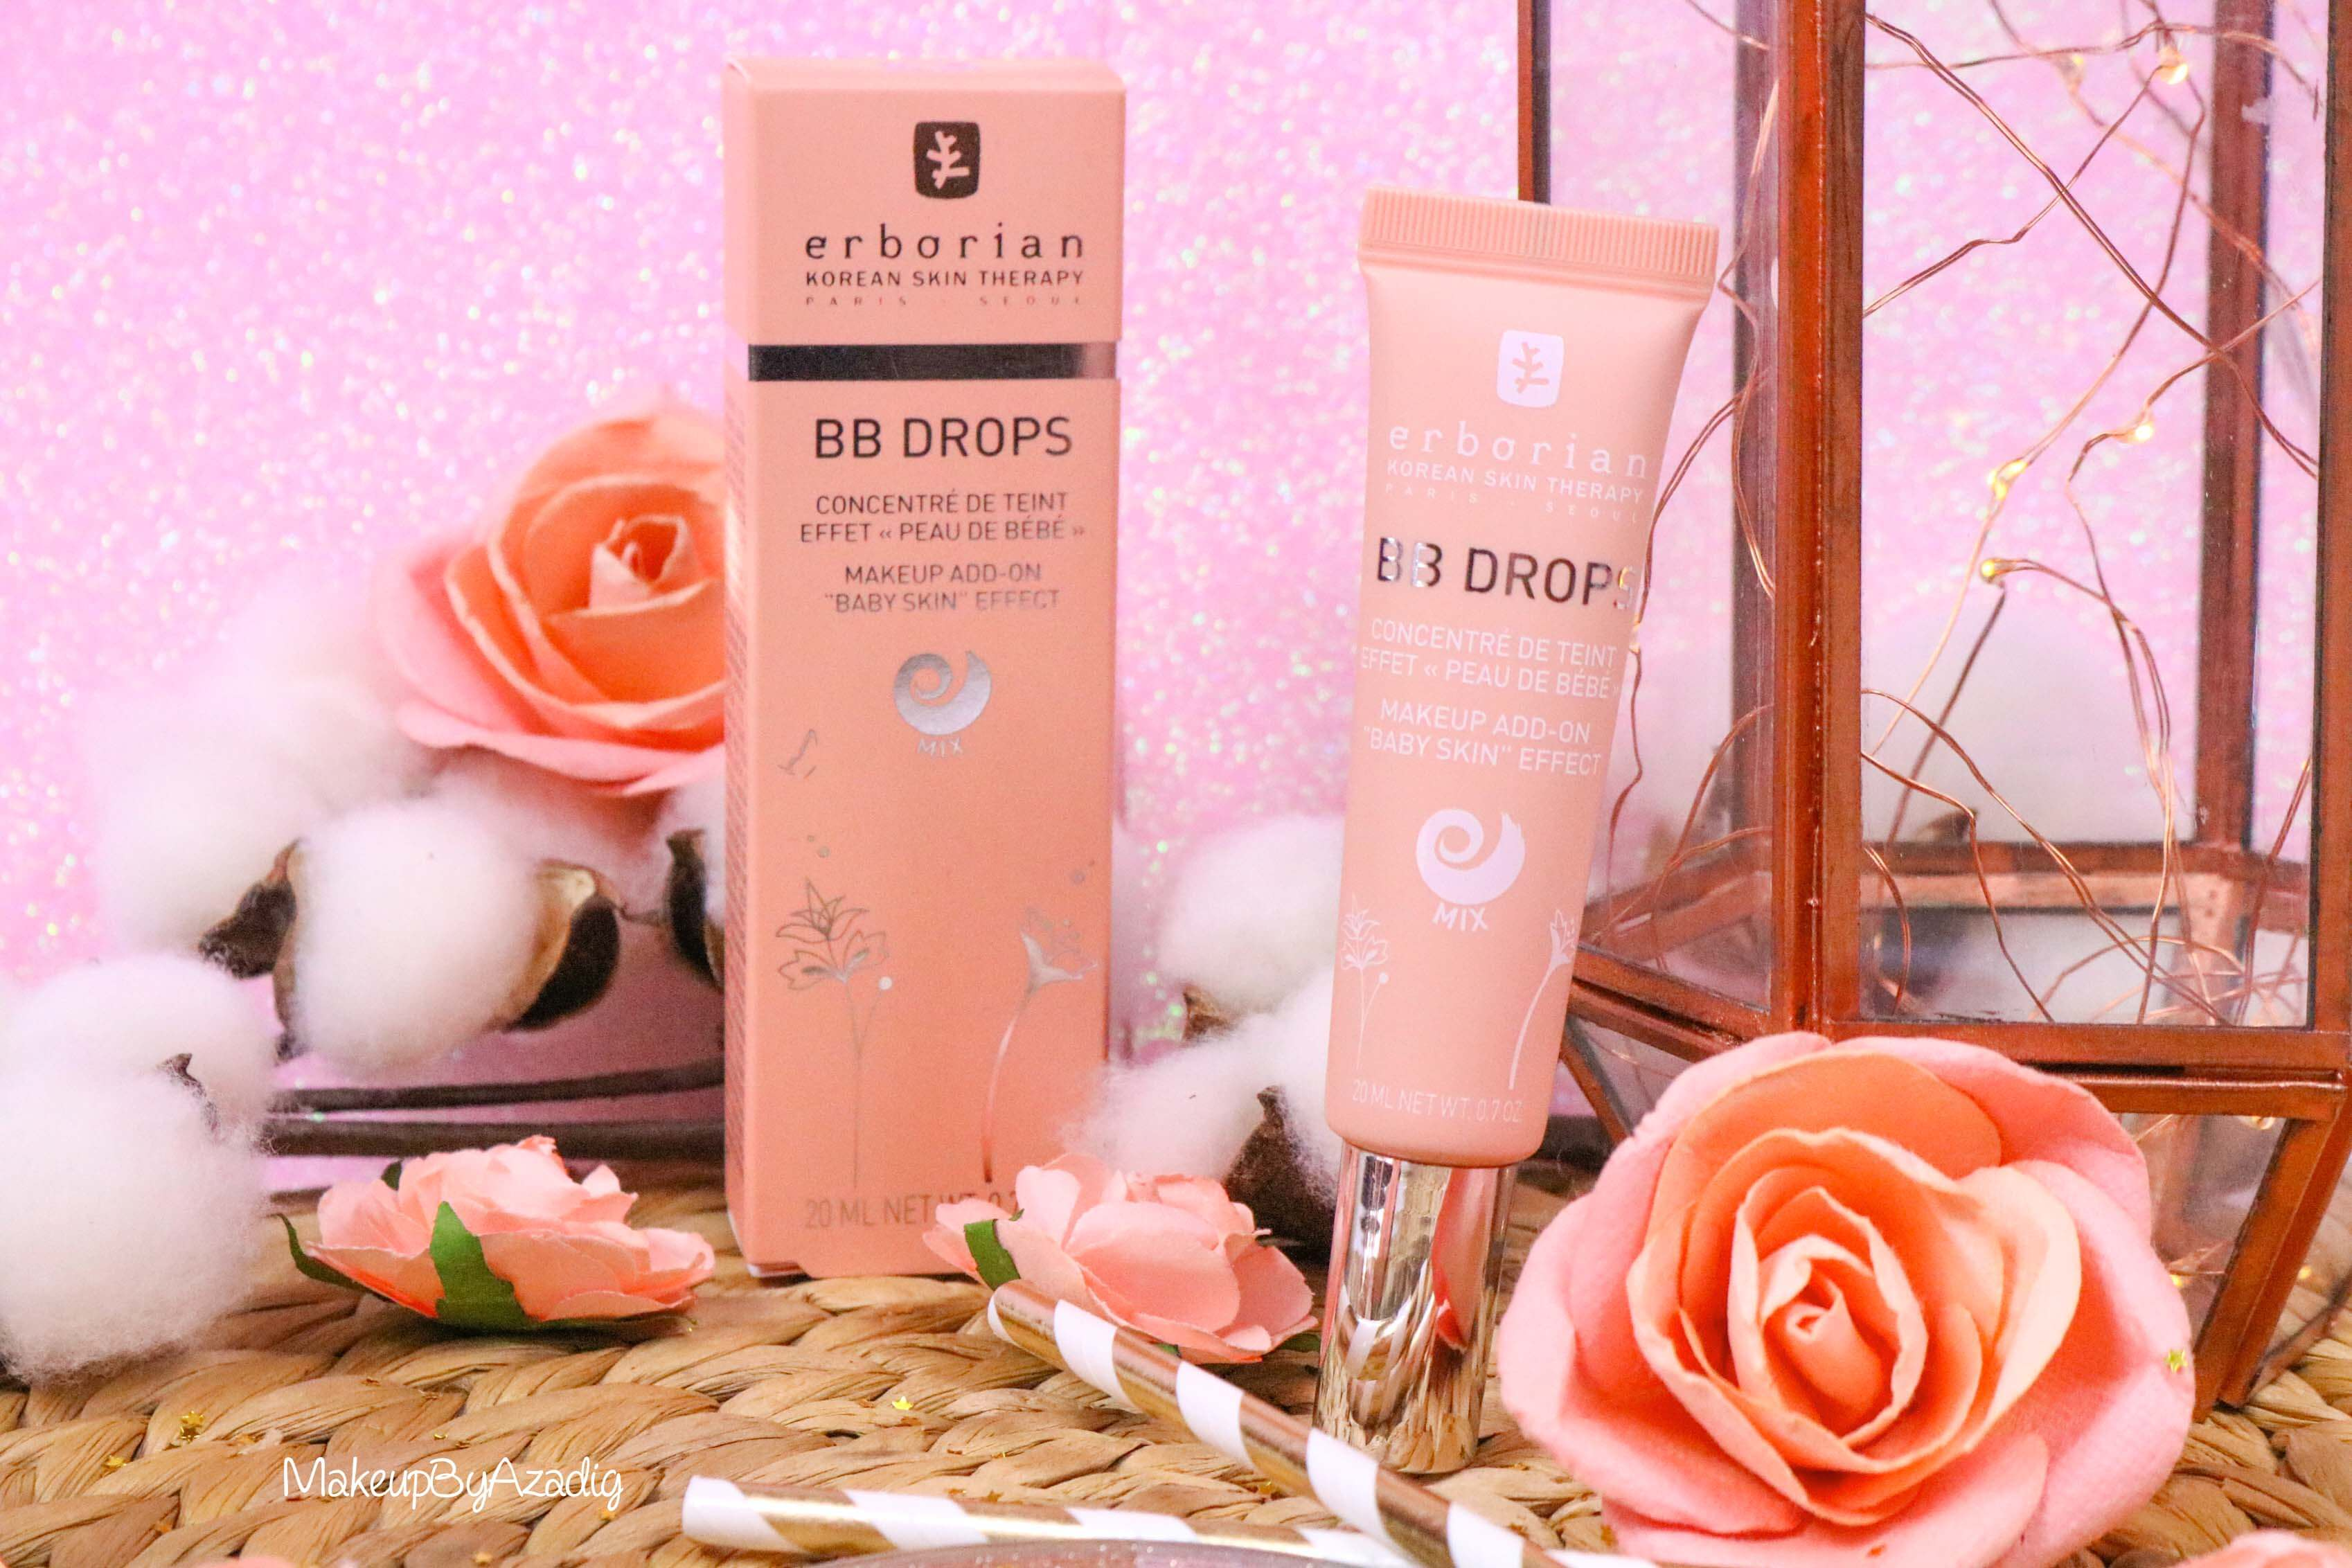 revue-bb-drops-mask-erborian-sephora-teint-parfait-de-bebe-avis-prix-swatch-makeupbyazadig-nouveaute-miniature